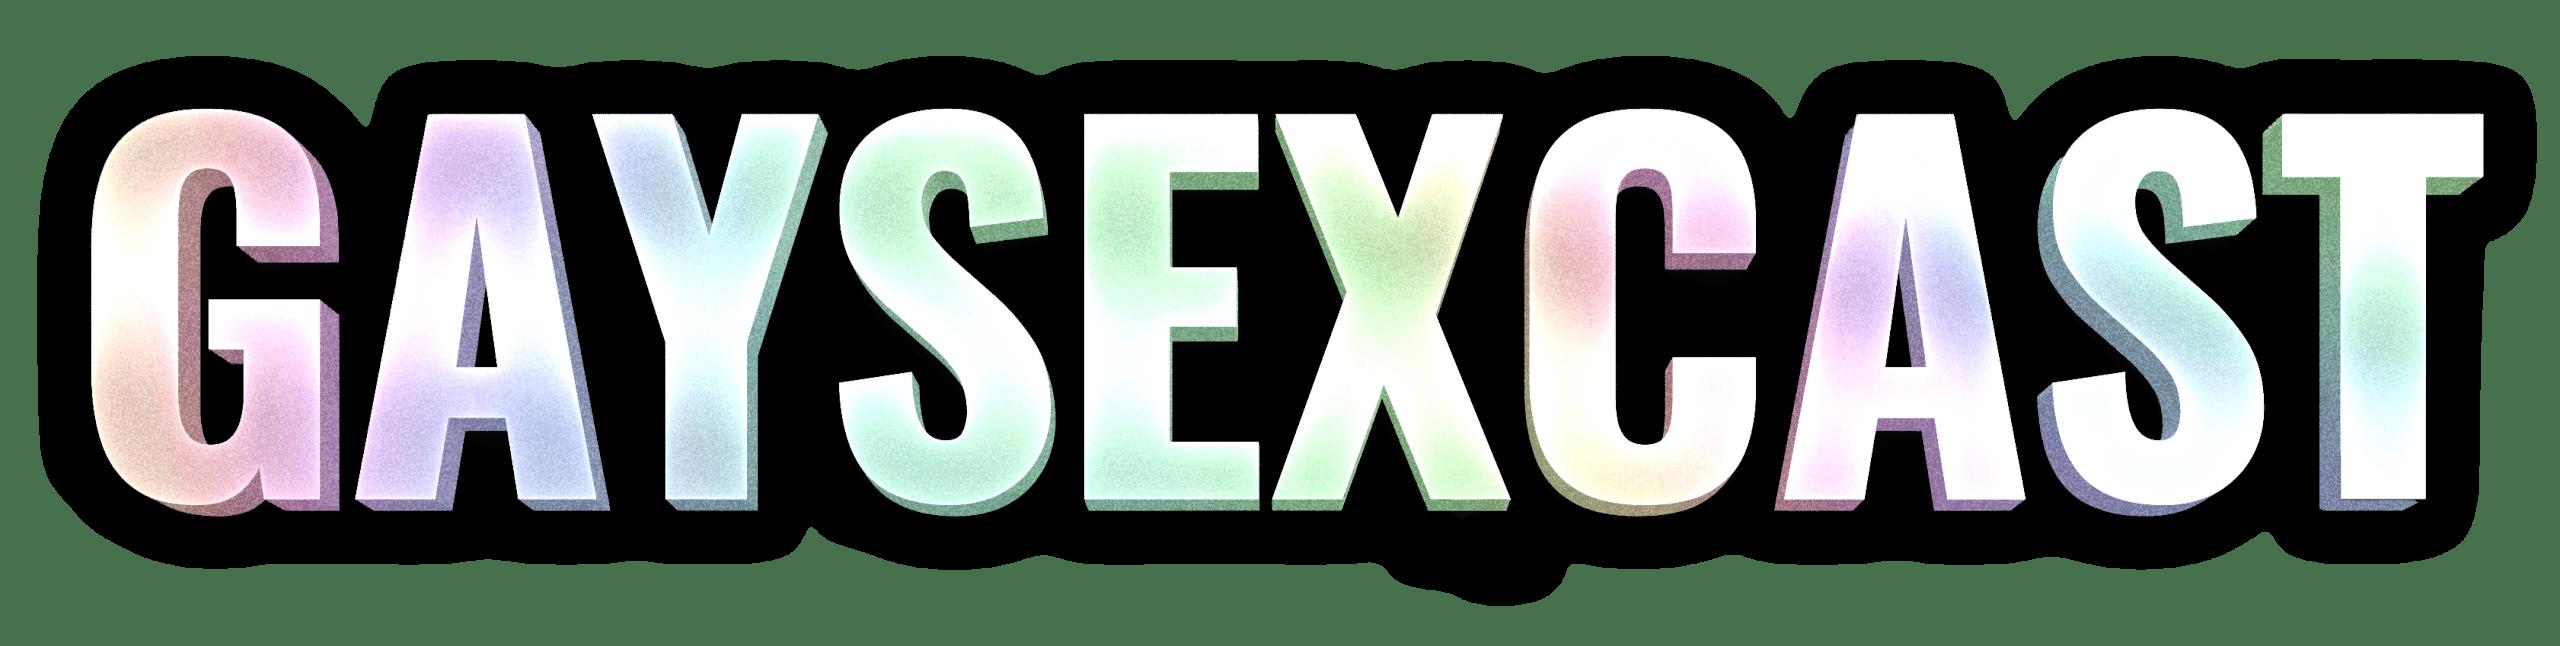 gaysexcast logo